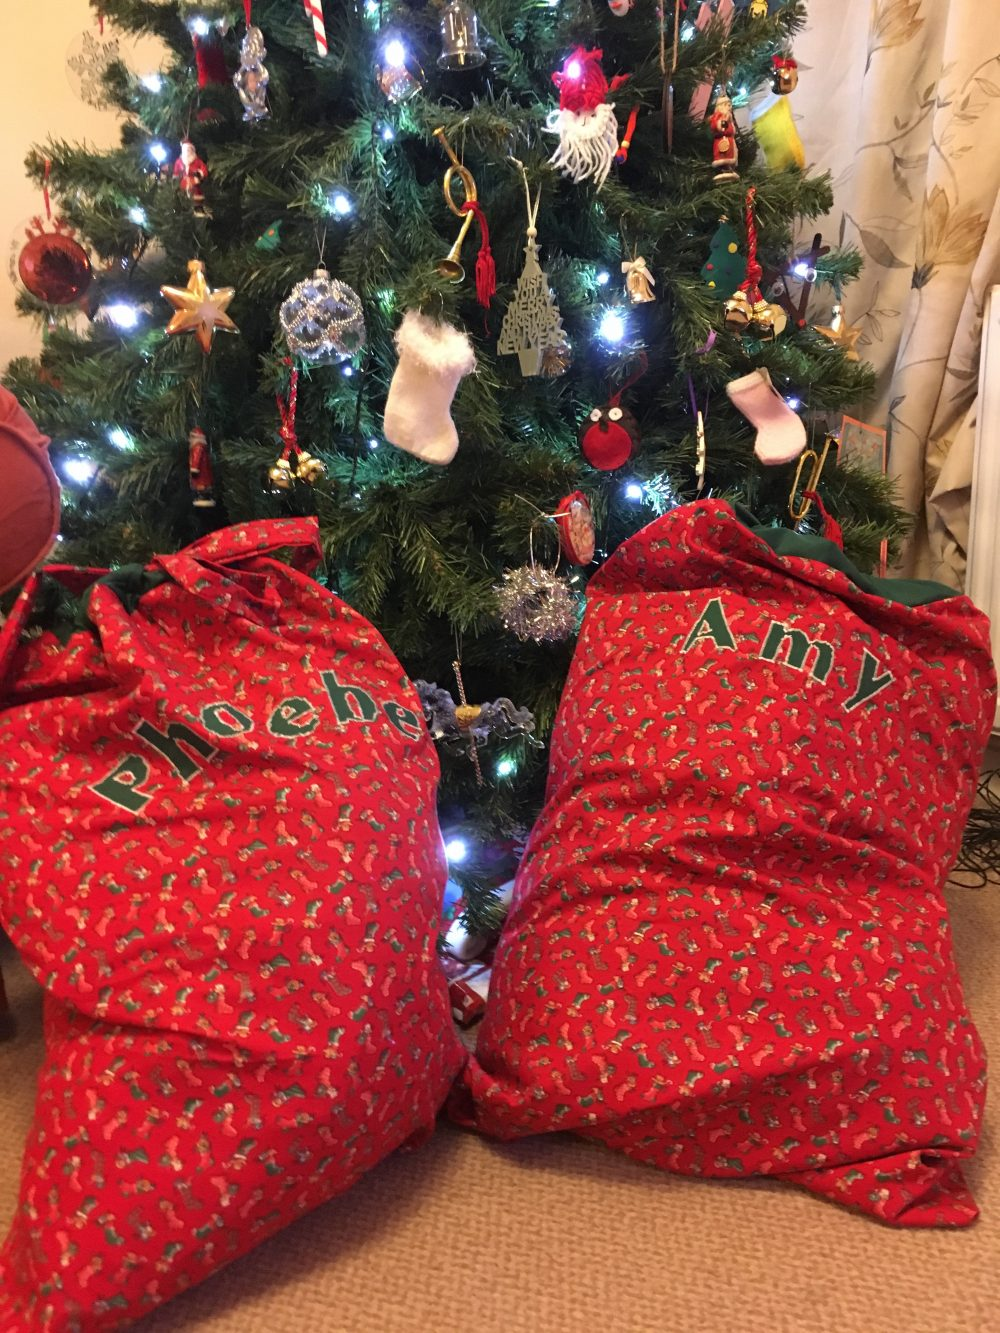 Personalised Santa Sack - Phoebe and Amy